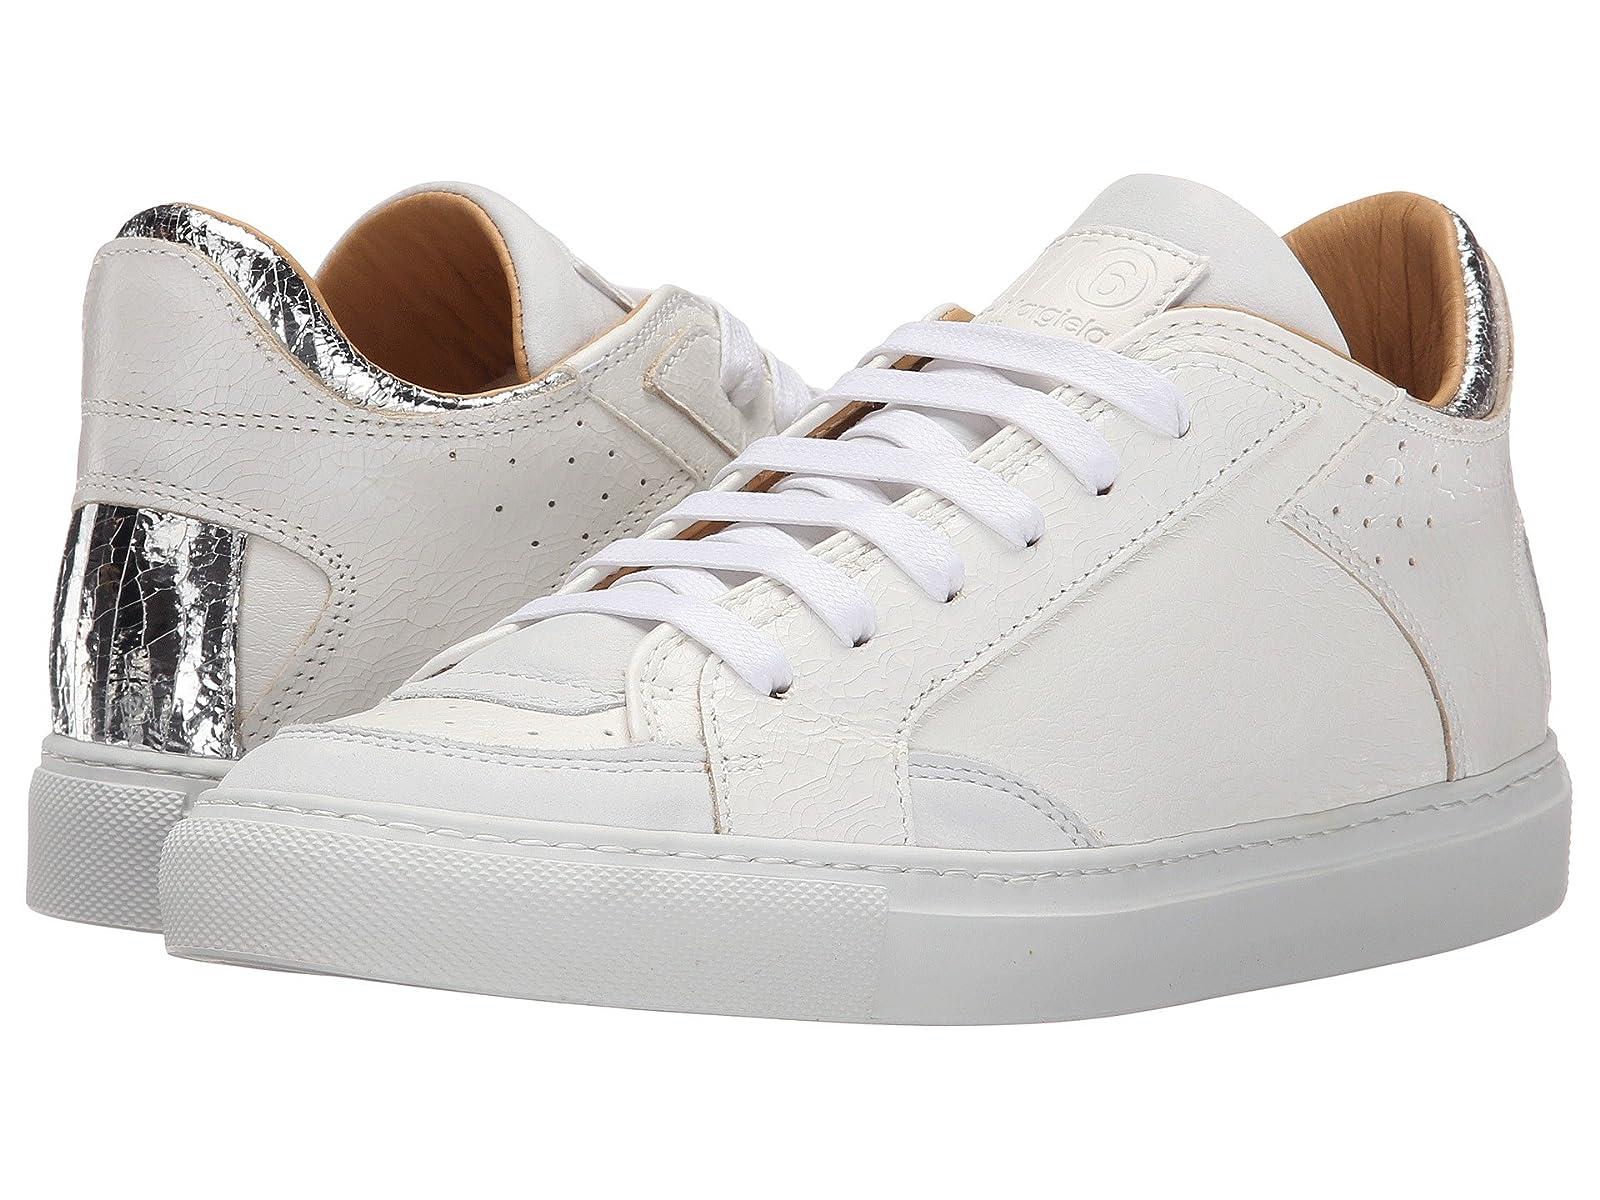 MM6 Maison Margiela Metallic Crackle Low Top SneakerAtmospheric grades have affordable shoes